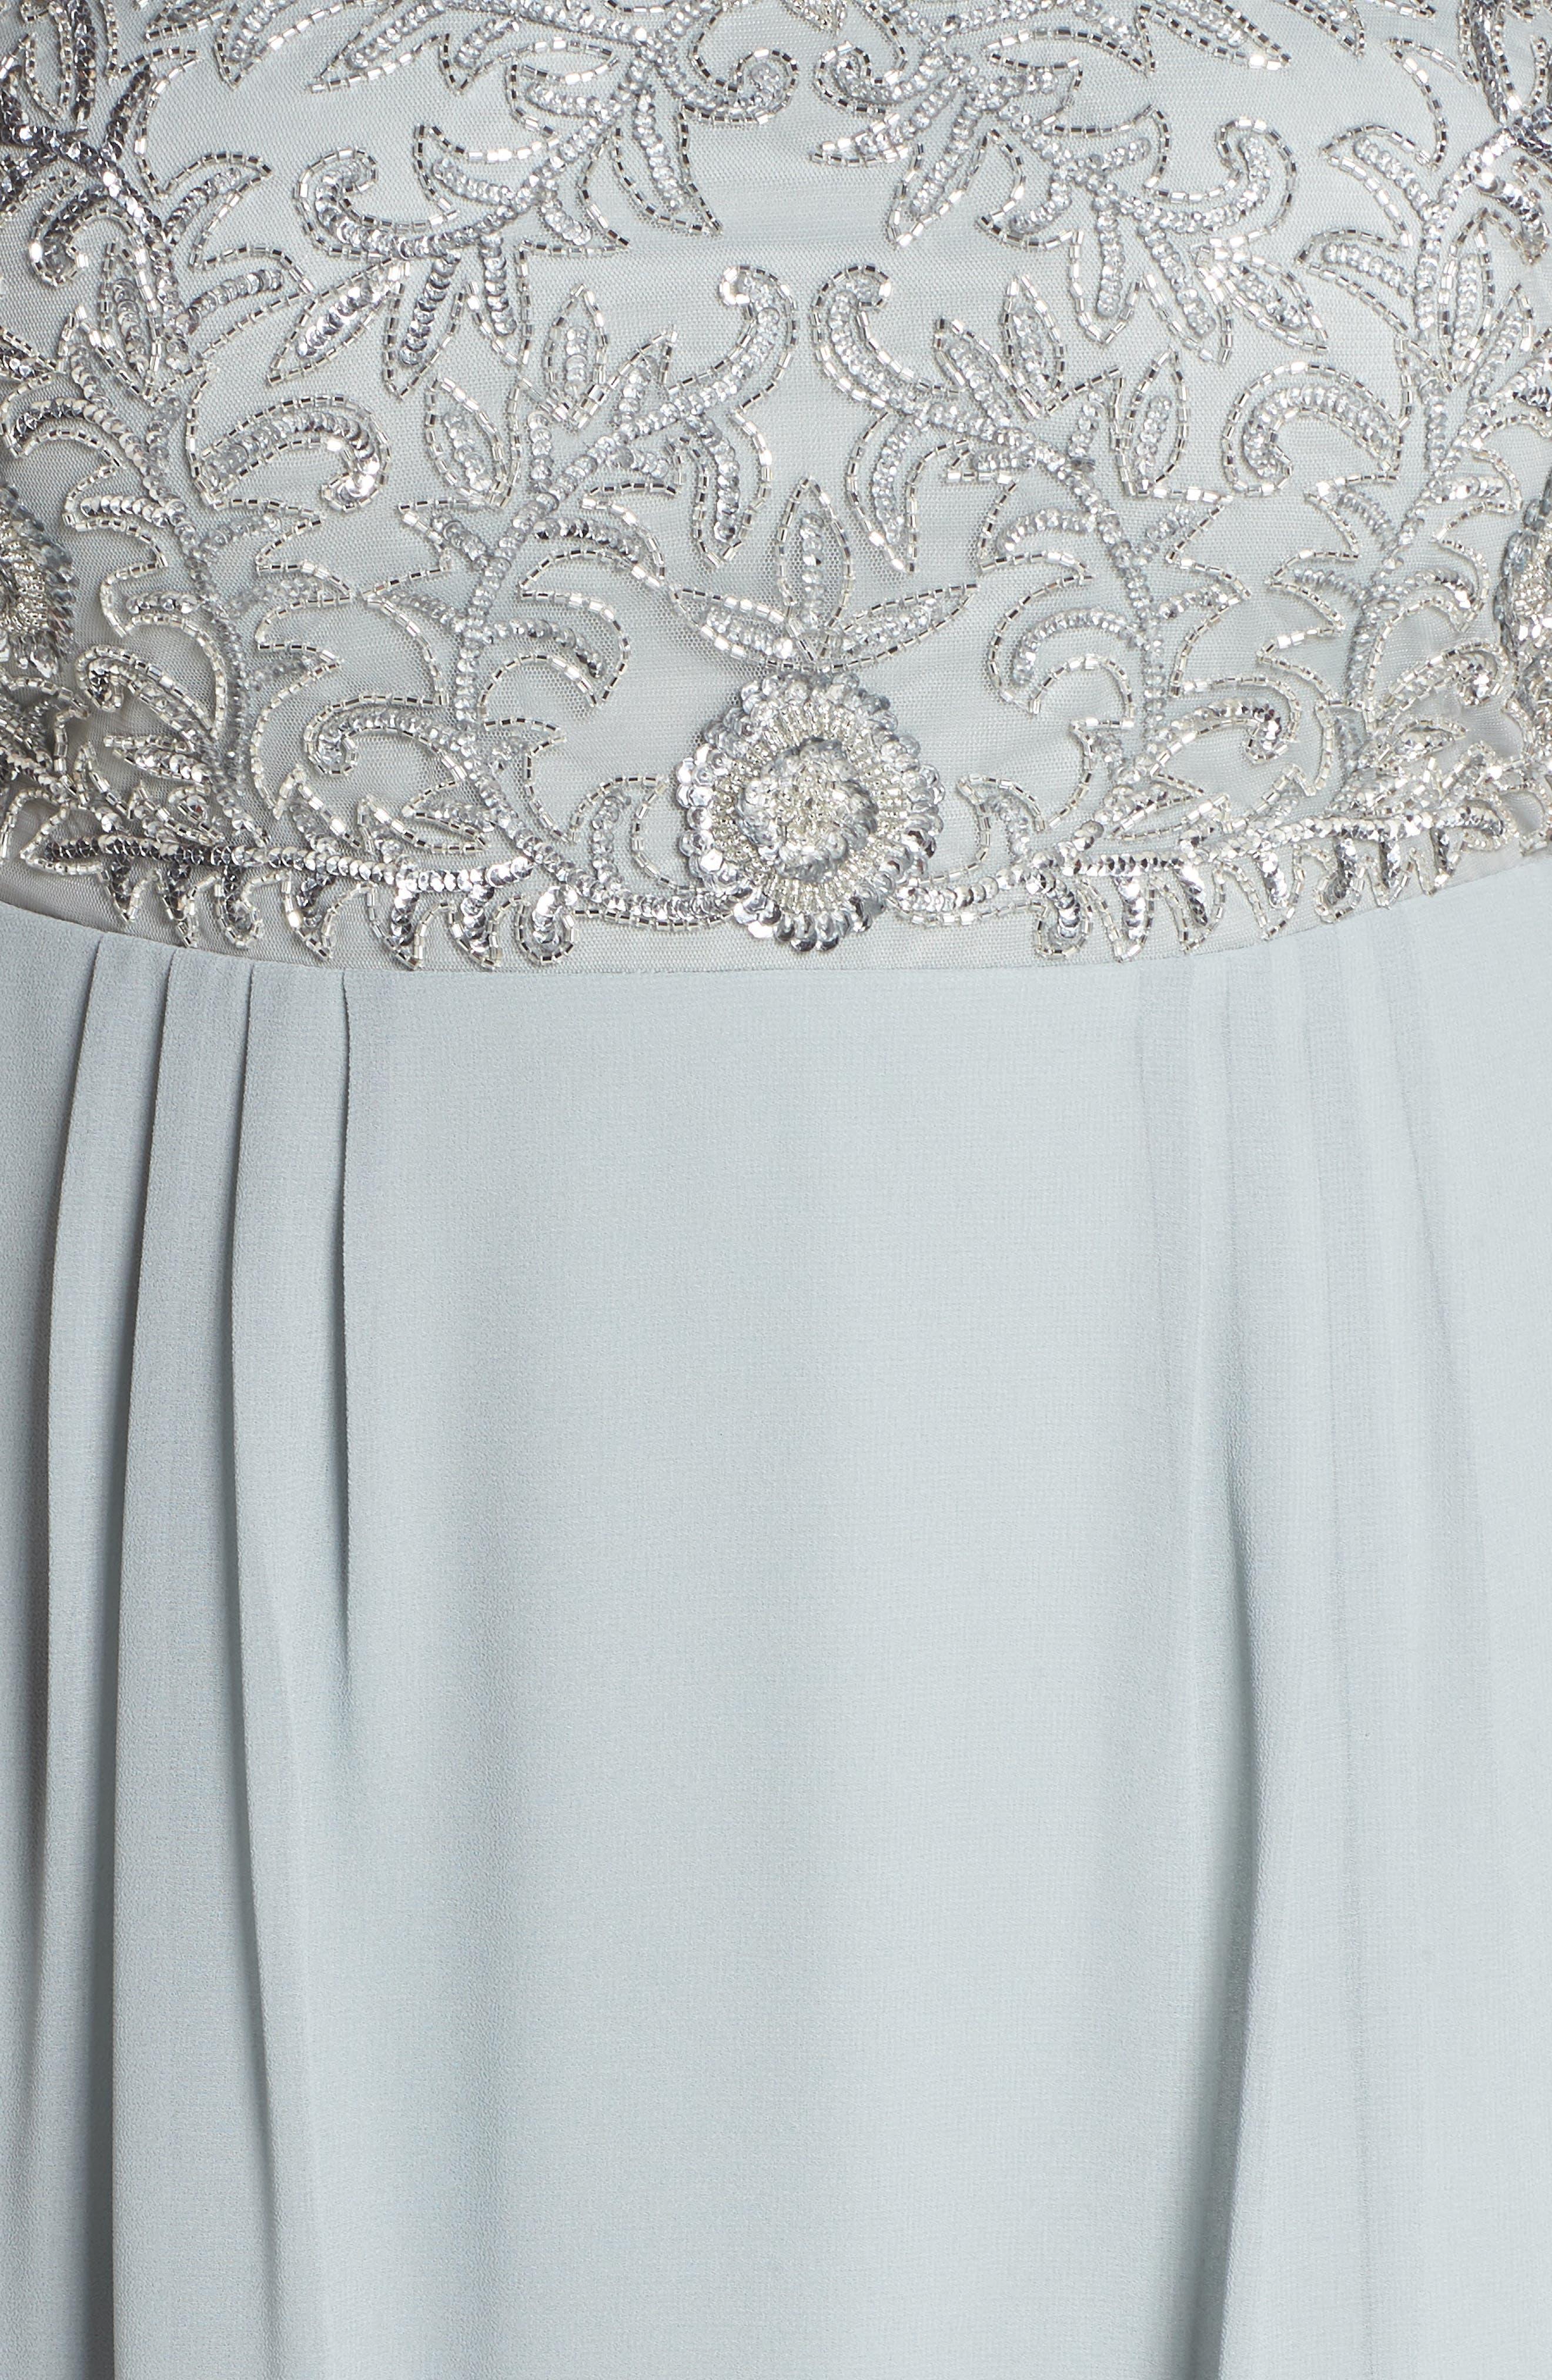 Beaded Midi Dress,                             Alternate thumbnail 5, color,                             Blue Mist